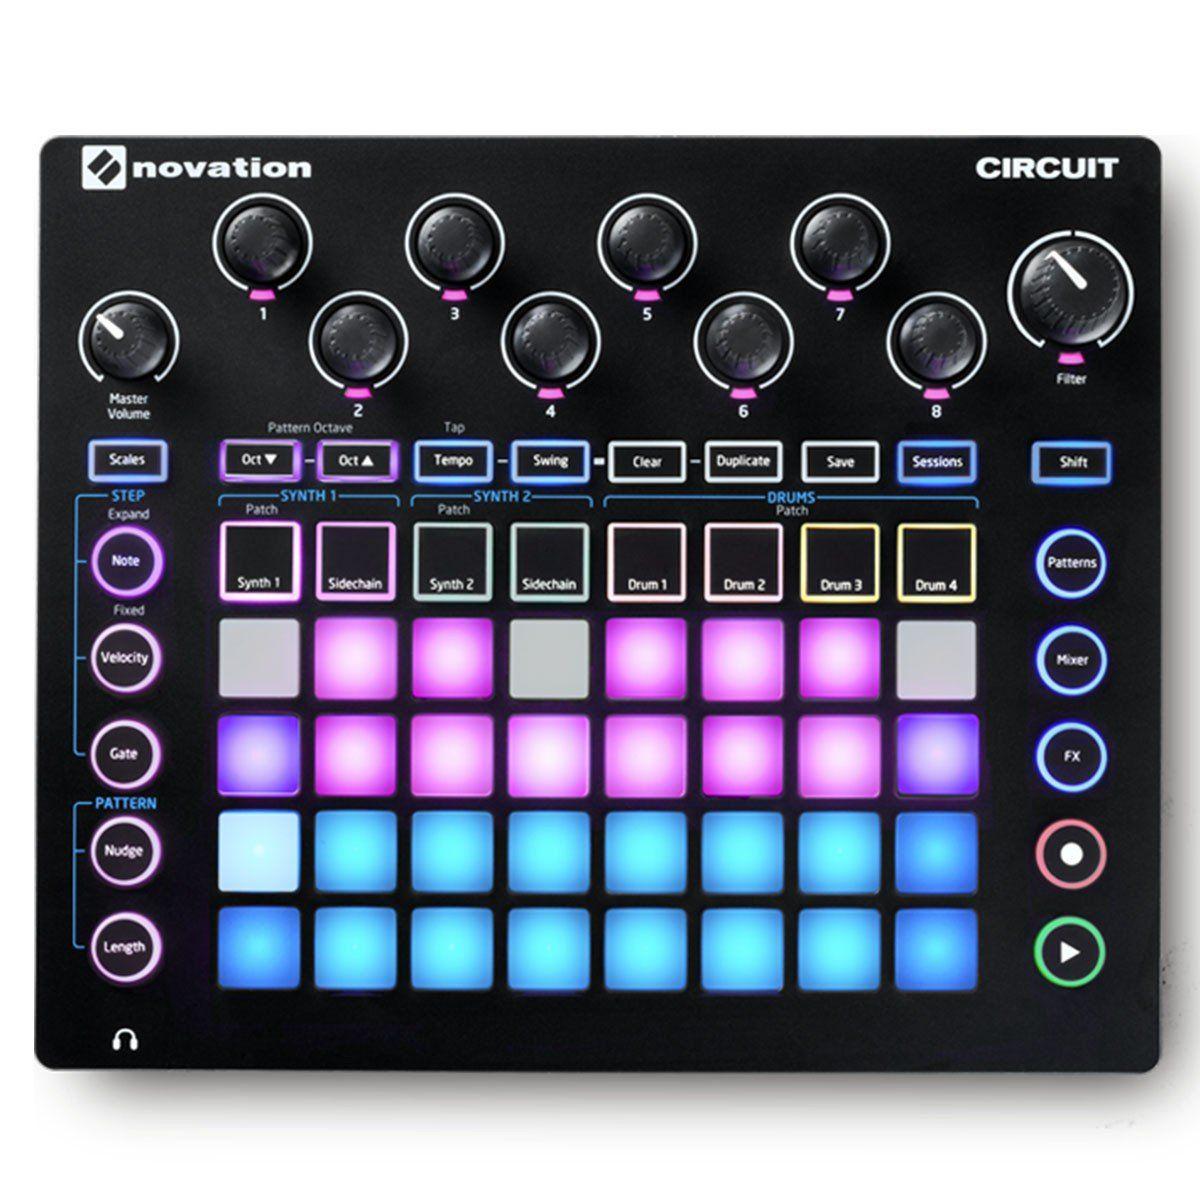 Novation Circuit Sintetizador Para Produção Musical Samples Beats